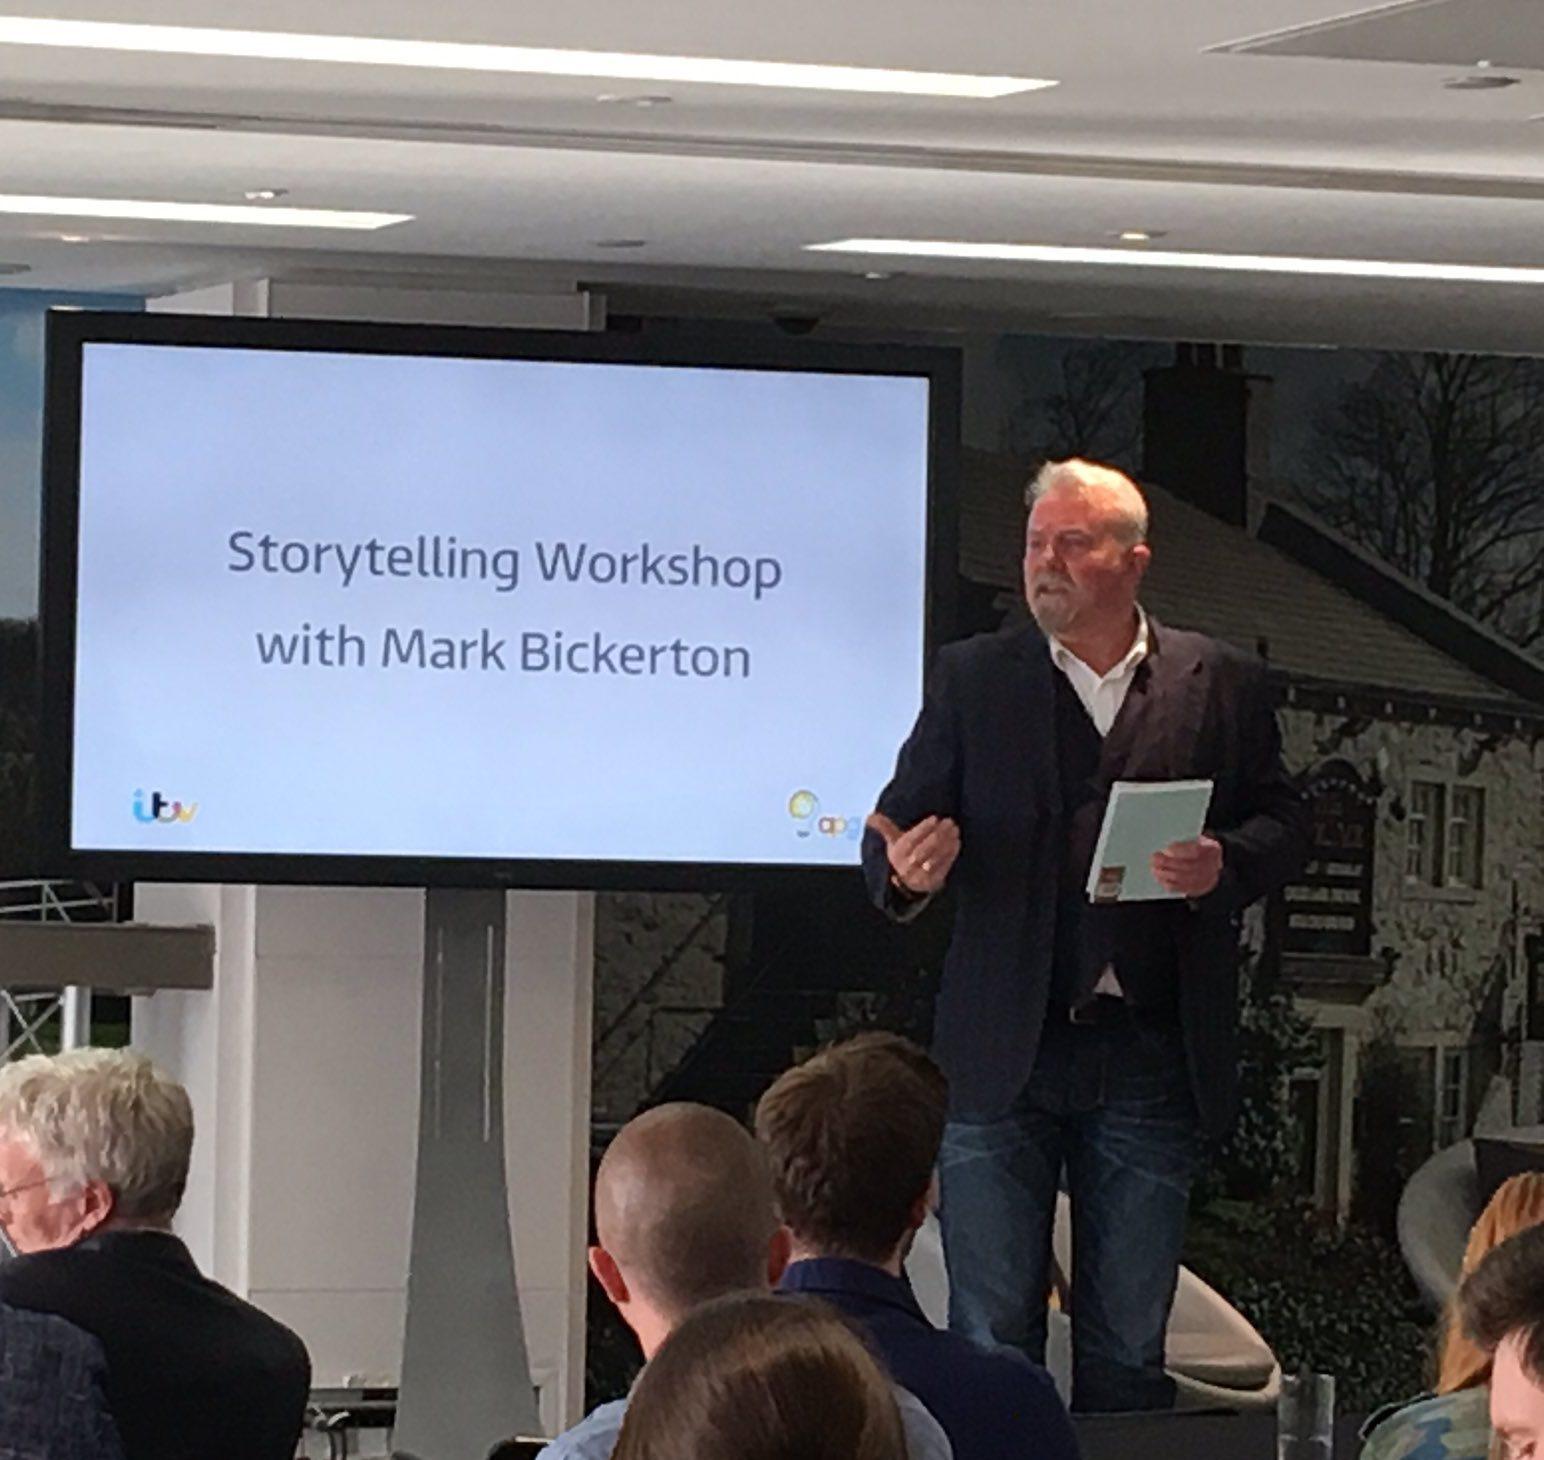 Mark Bickerton